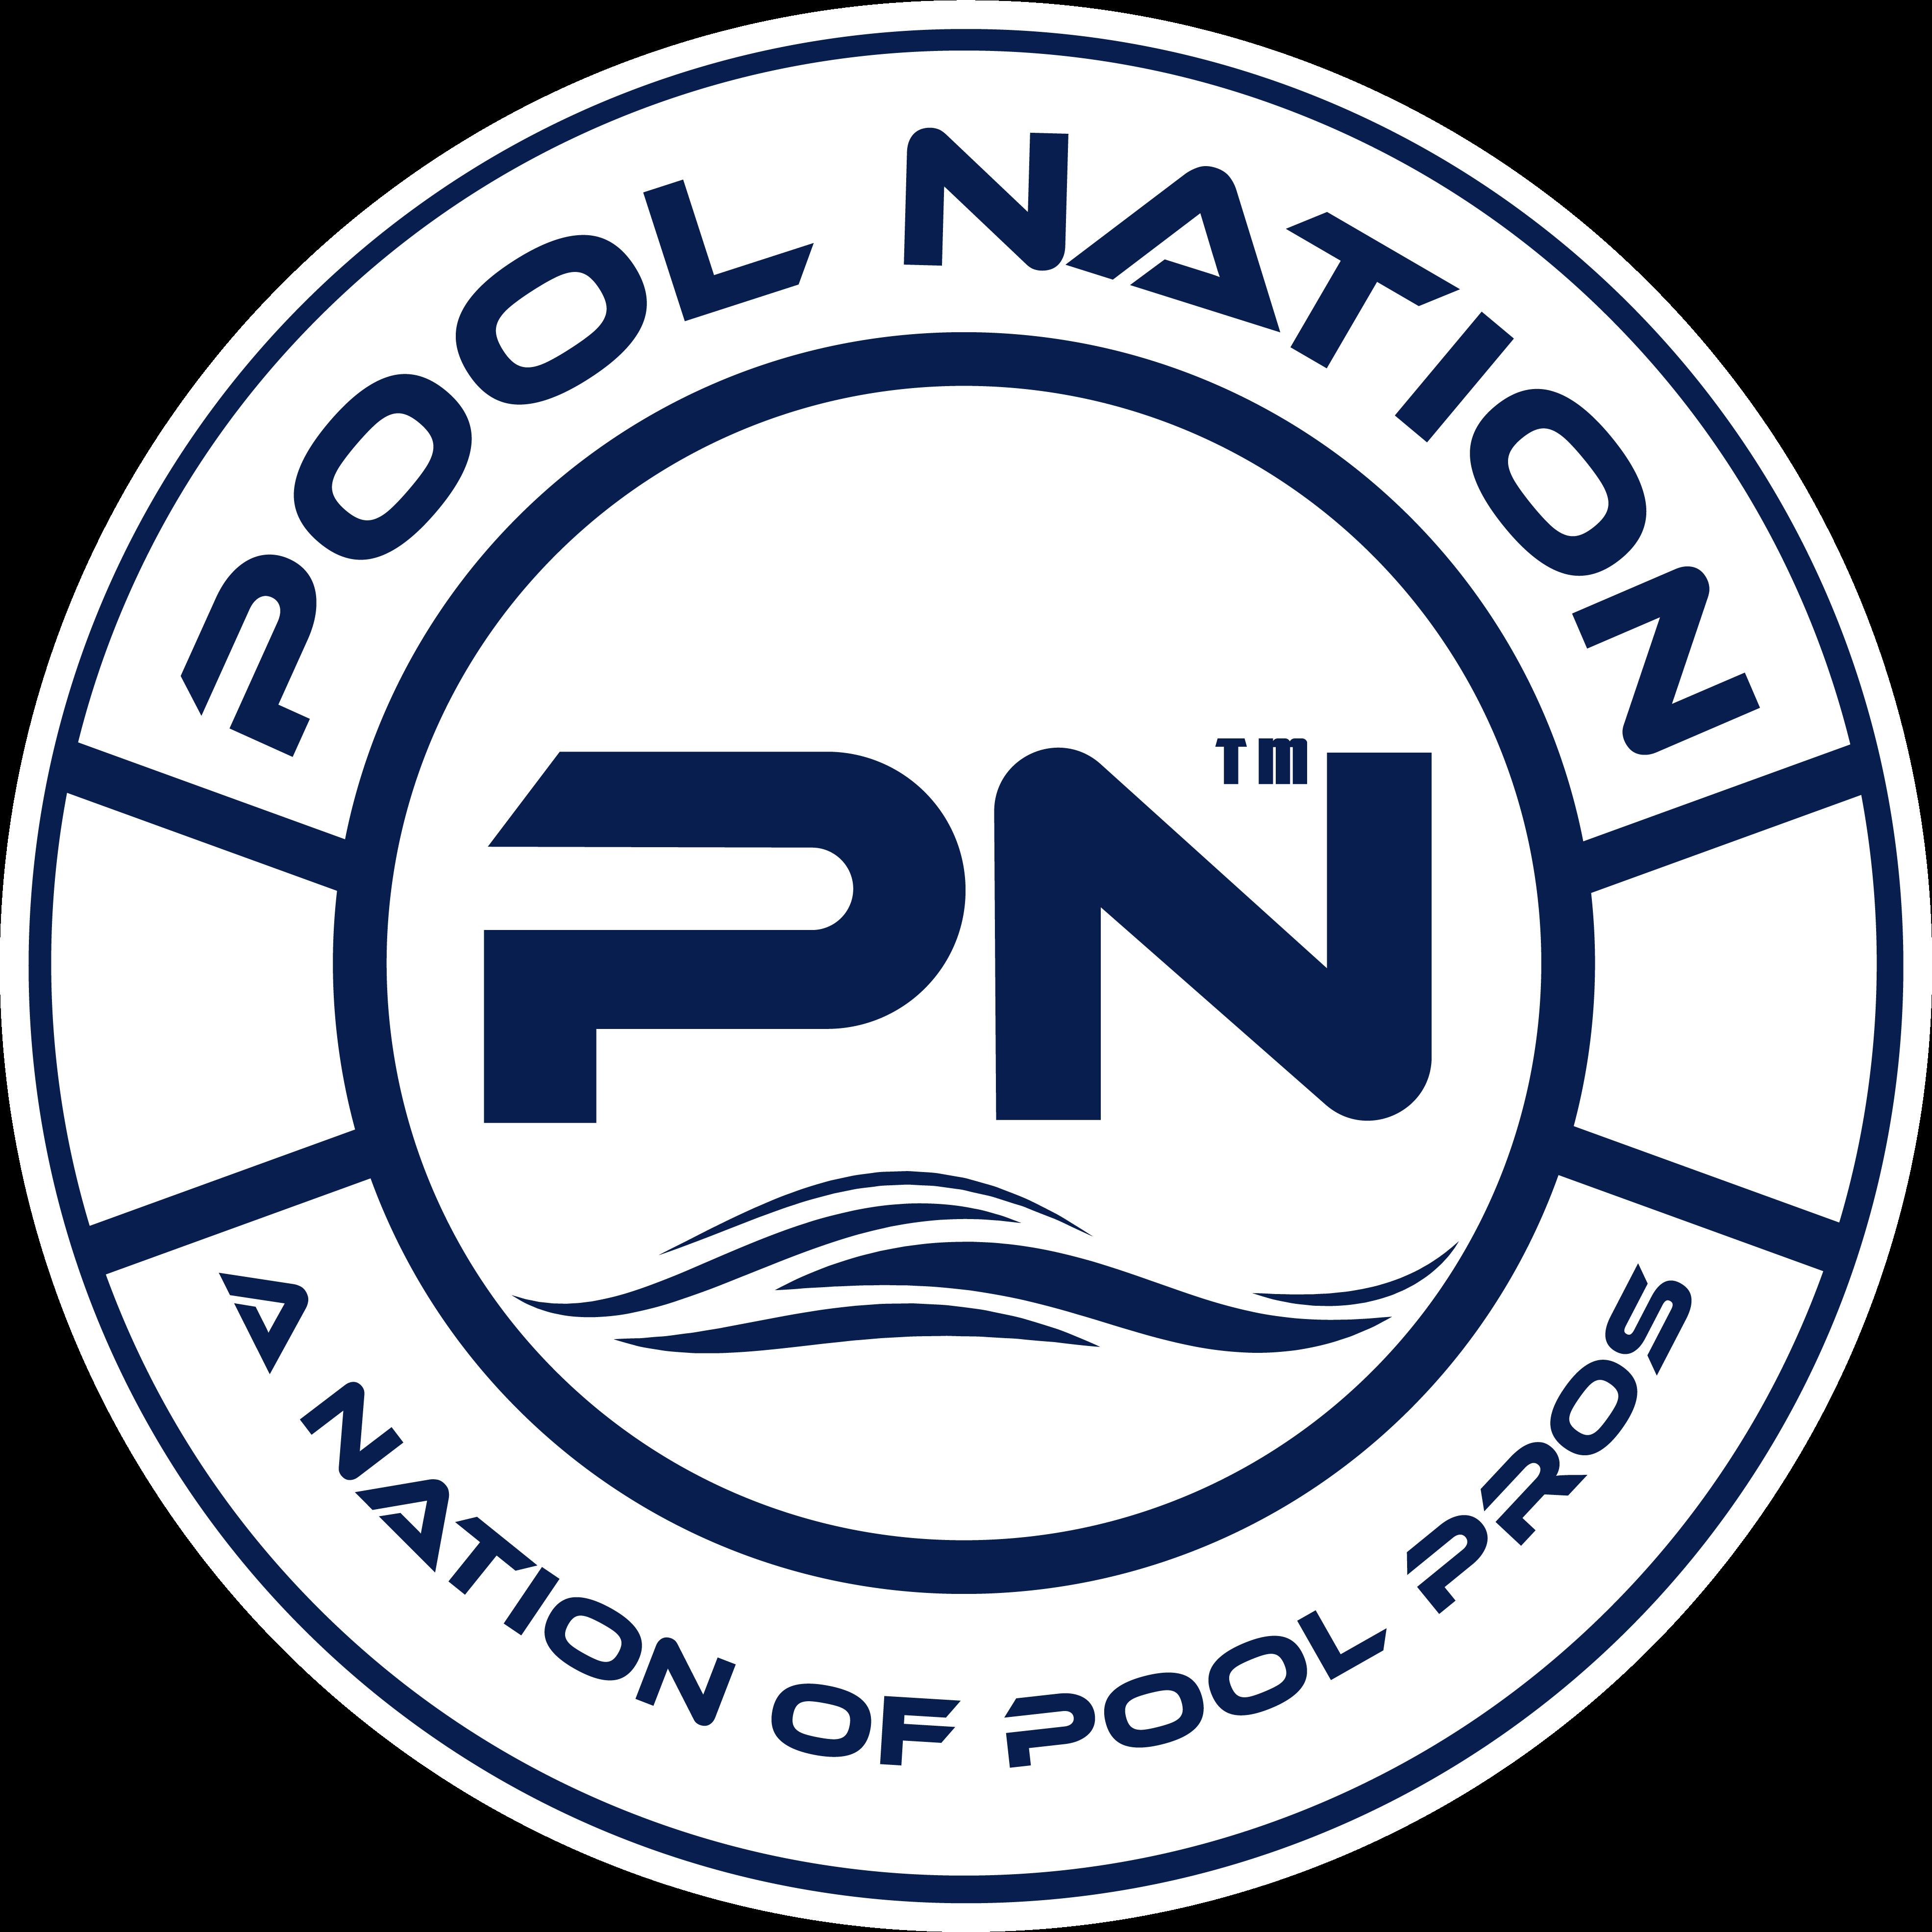 POOLNATION LOGO